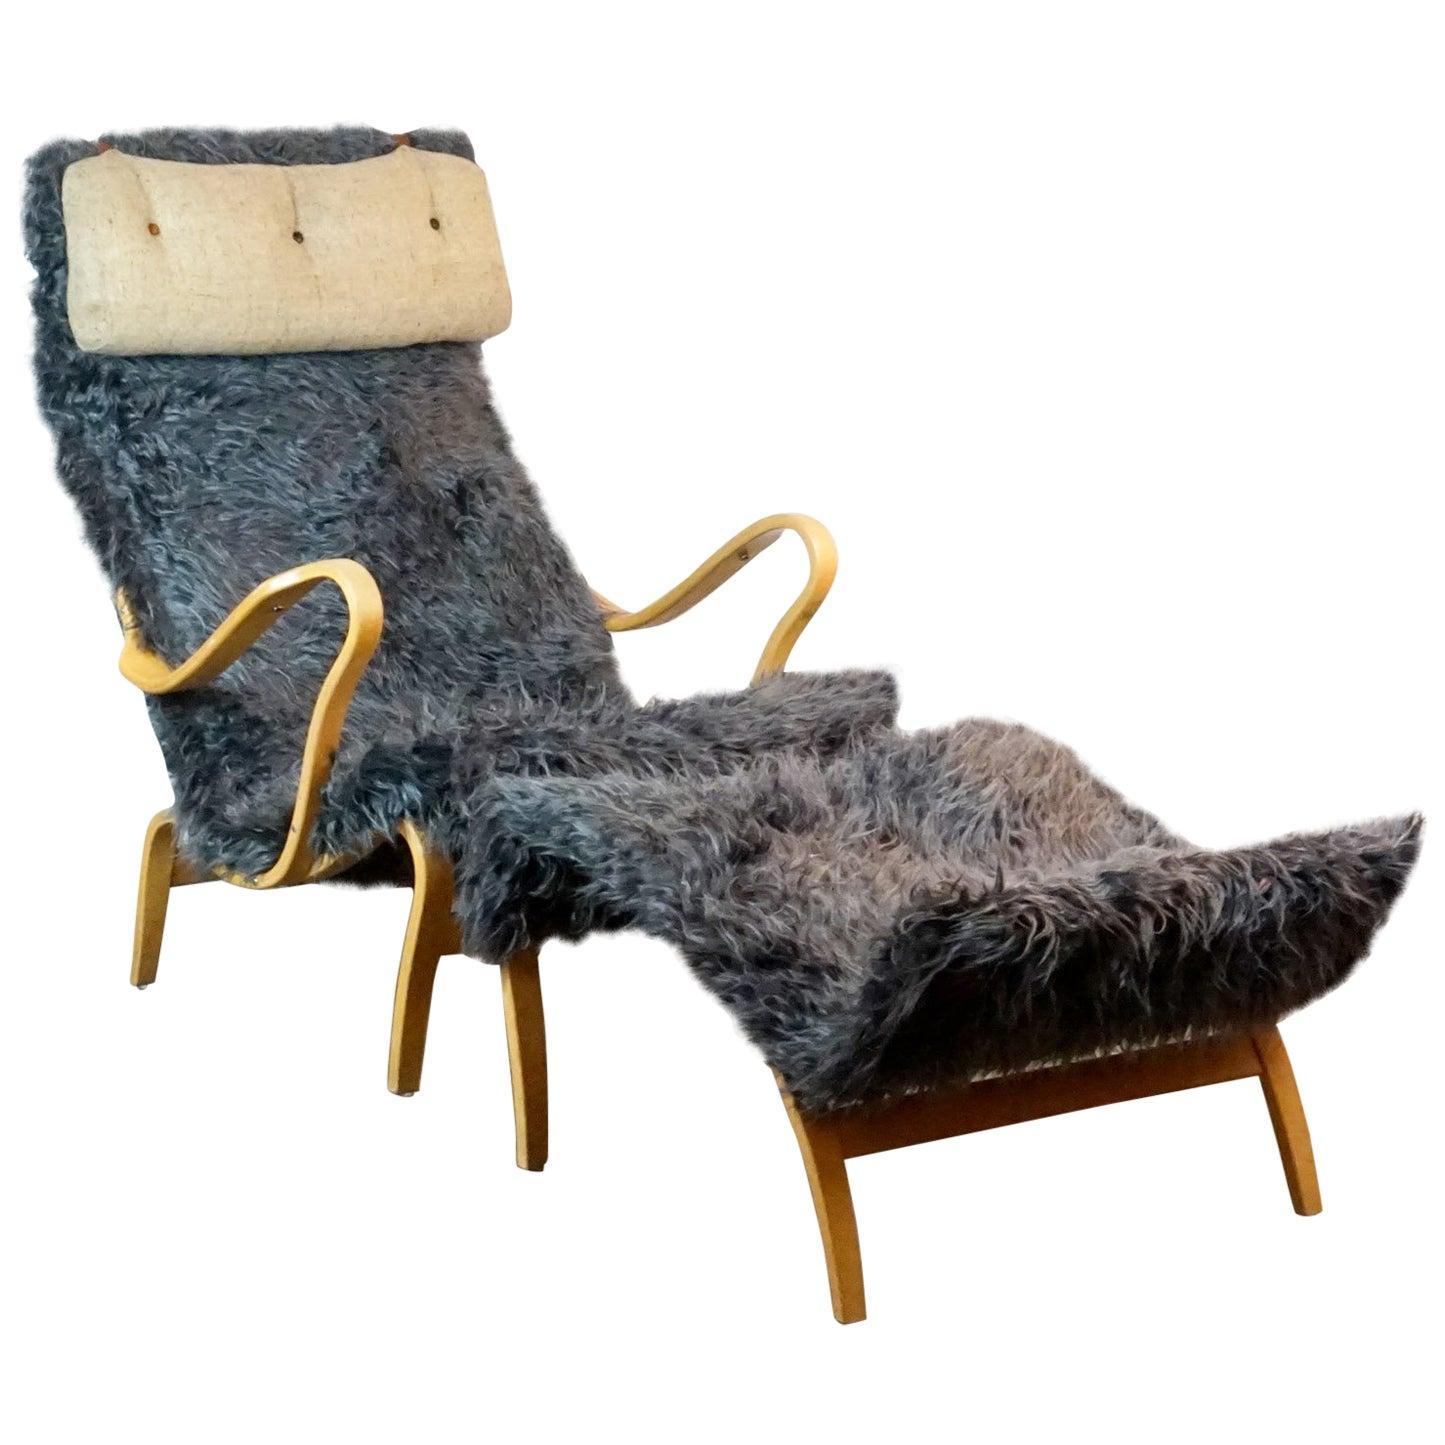 Scandinavian Beech Pernilla Lounge Chair with Ottoman by Bruno Mathsson for DUX